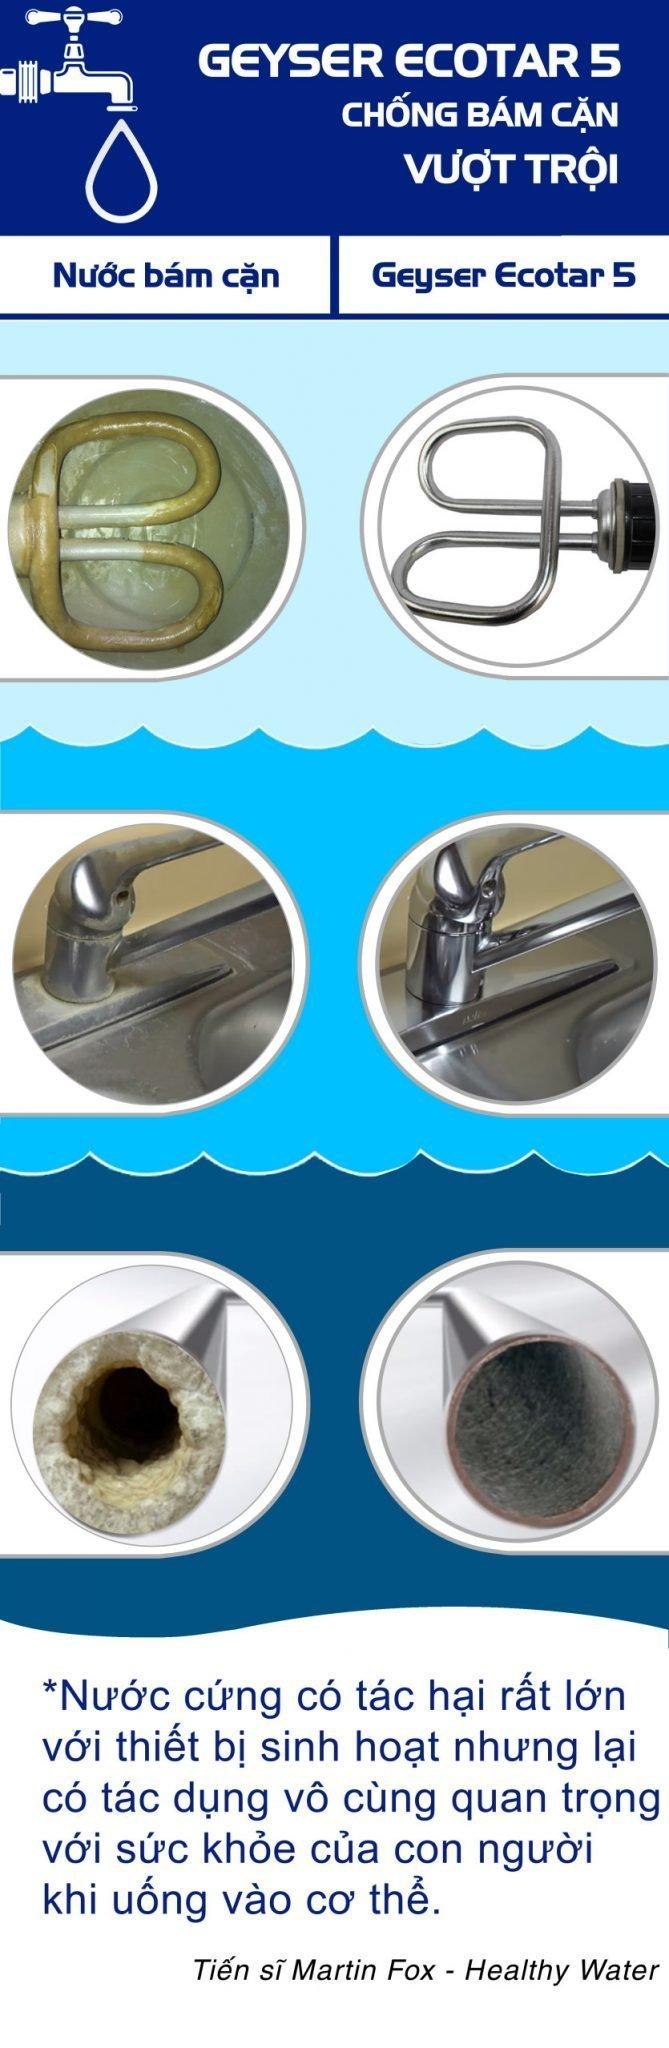 máy lọc nước Geyser Ecotar 5 LB Nga